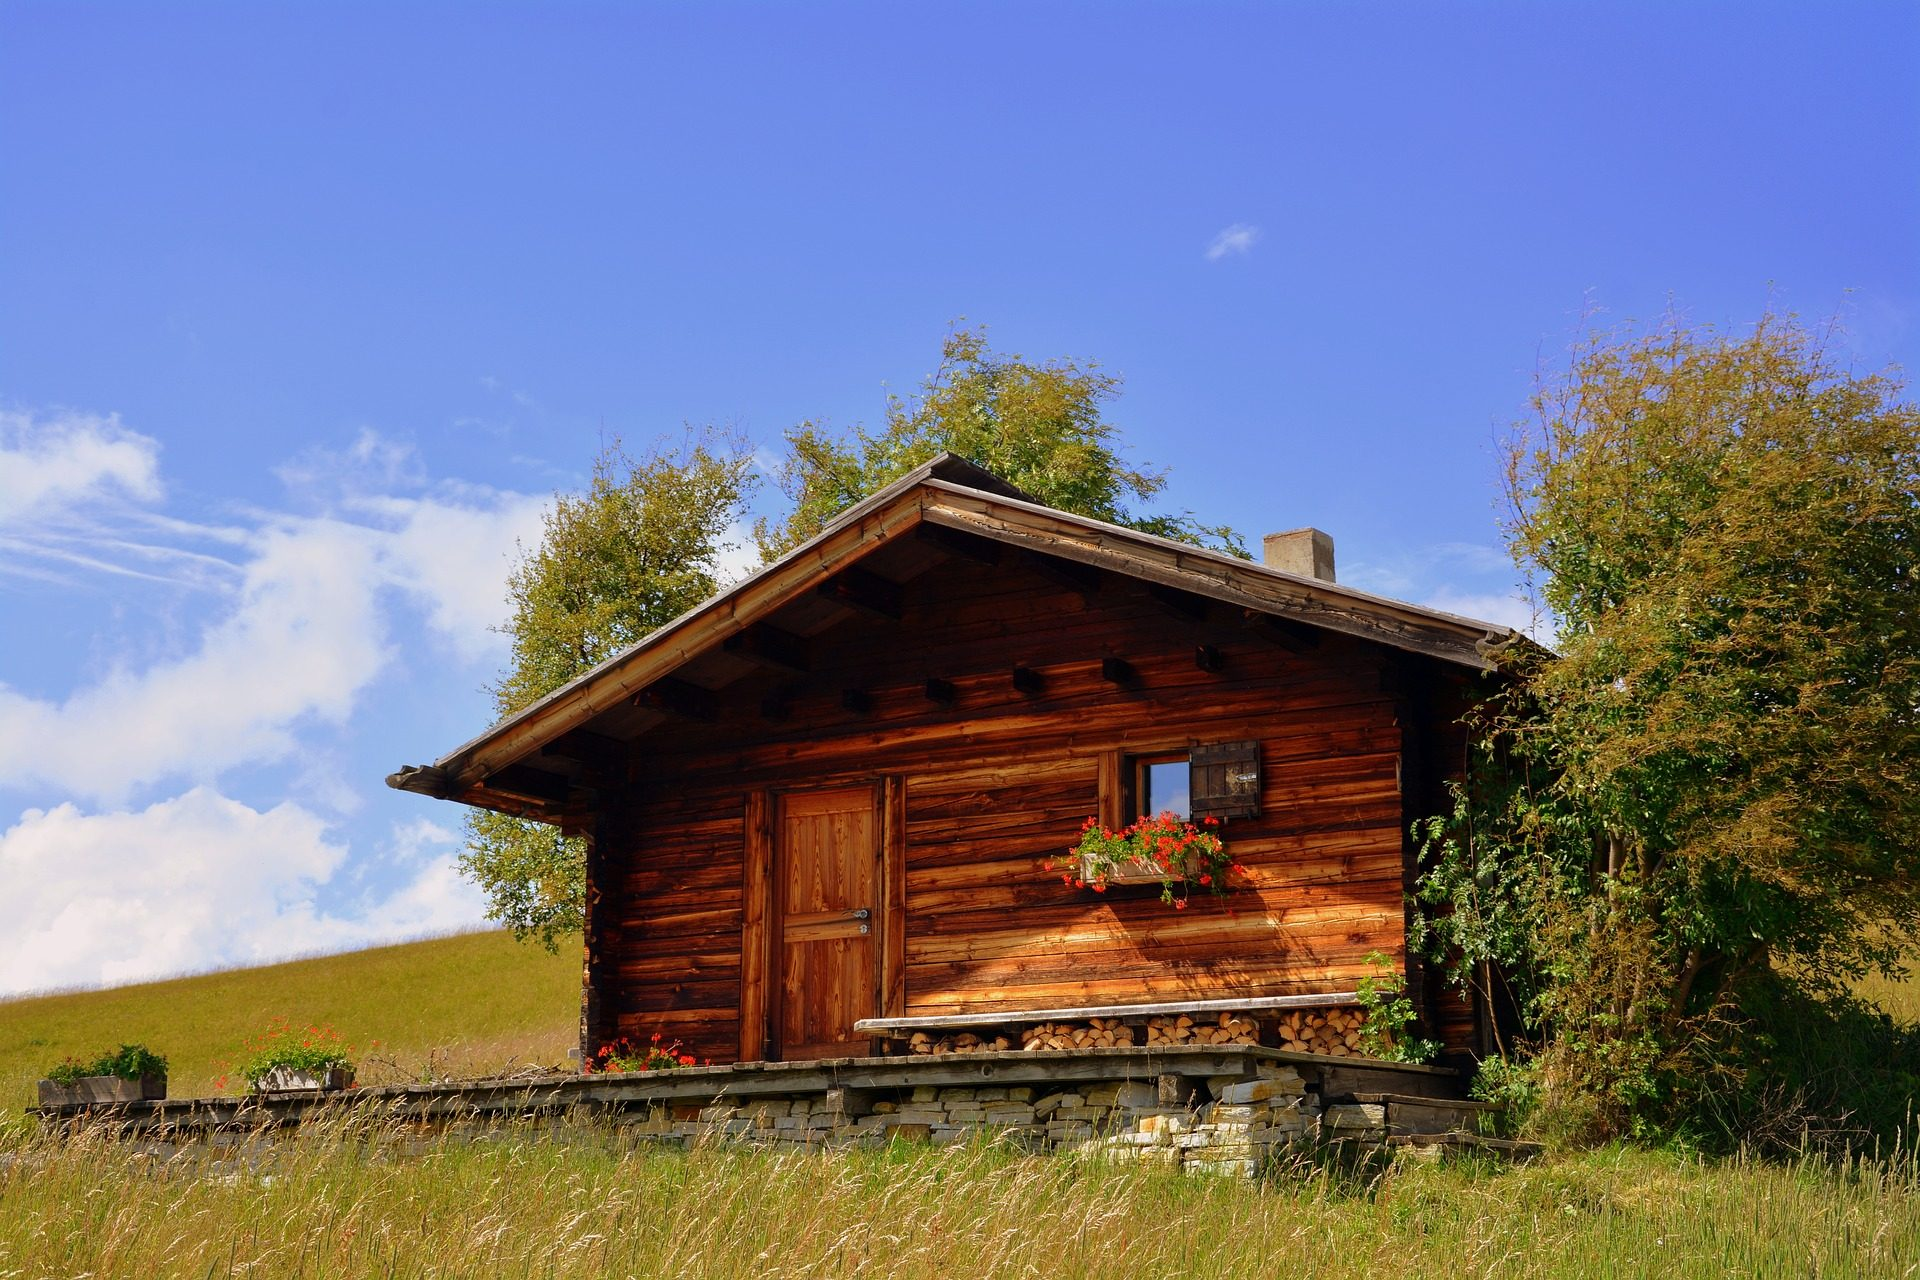 Maison, Pradera, domaine, bois, arbres - Fonds d'écran HD - Professor-falken.com